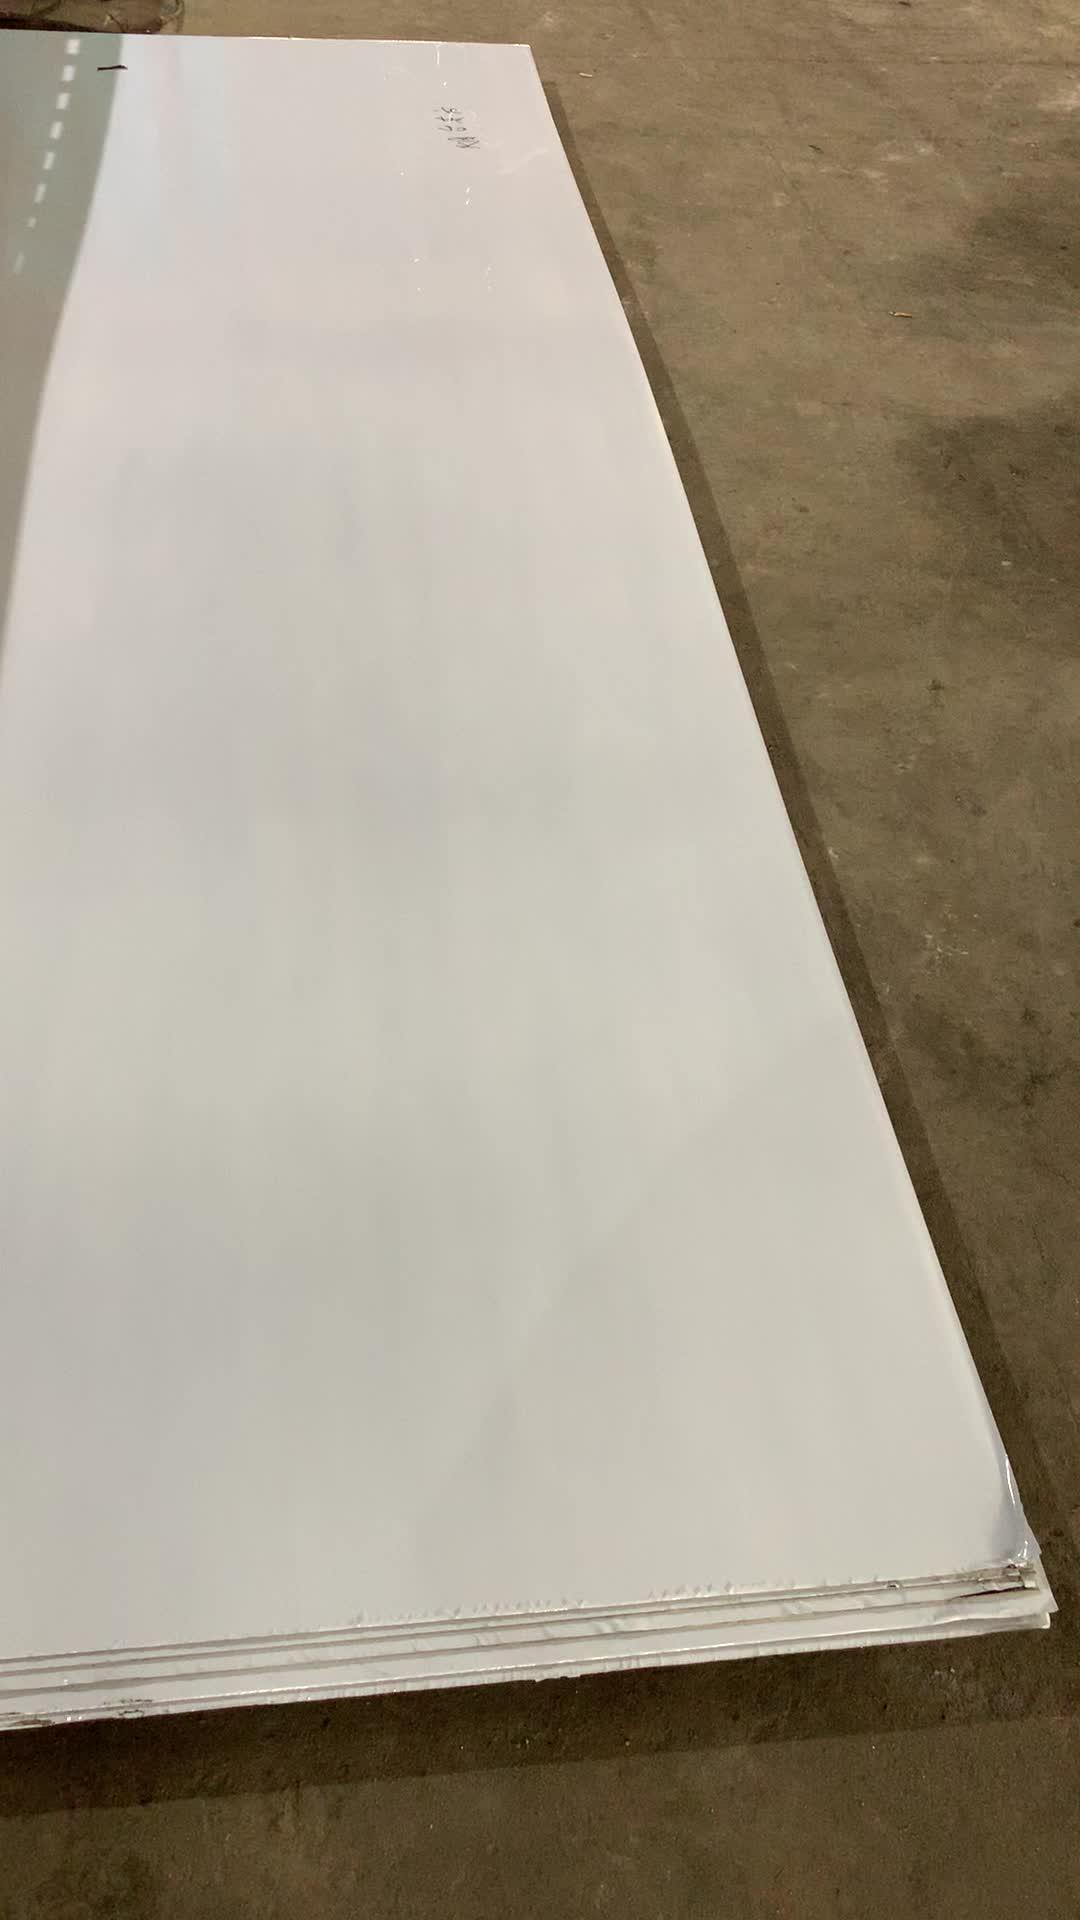 SS Sheet  Water Ripple Steel Plate Stainless Steel Sheet Checker Plate